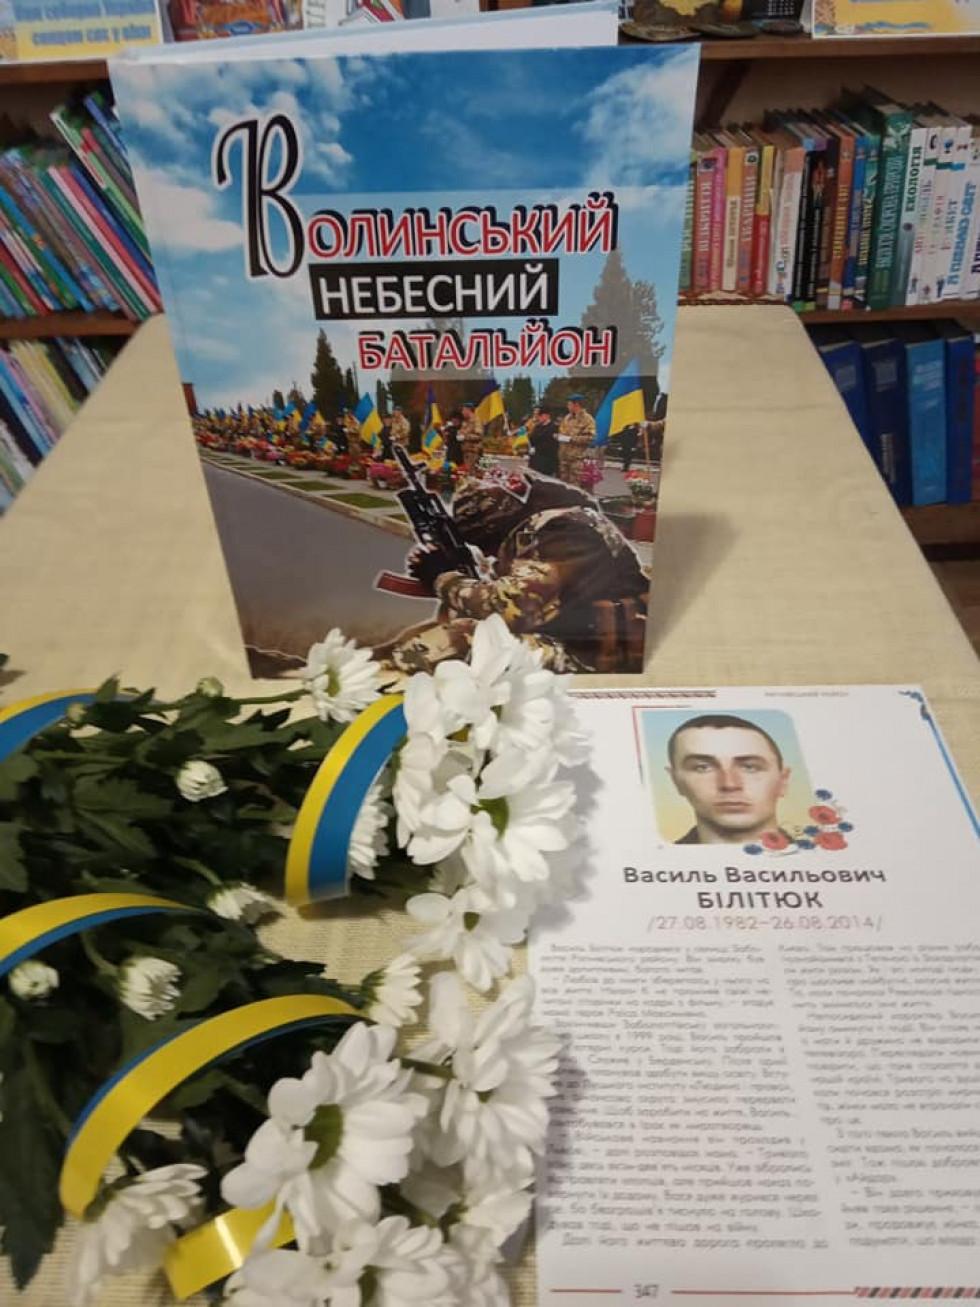 Книга «Волинський небесний батальйон»